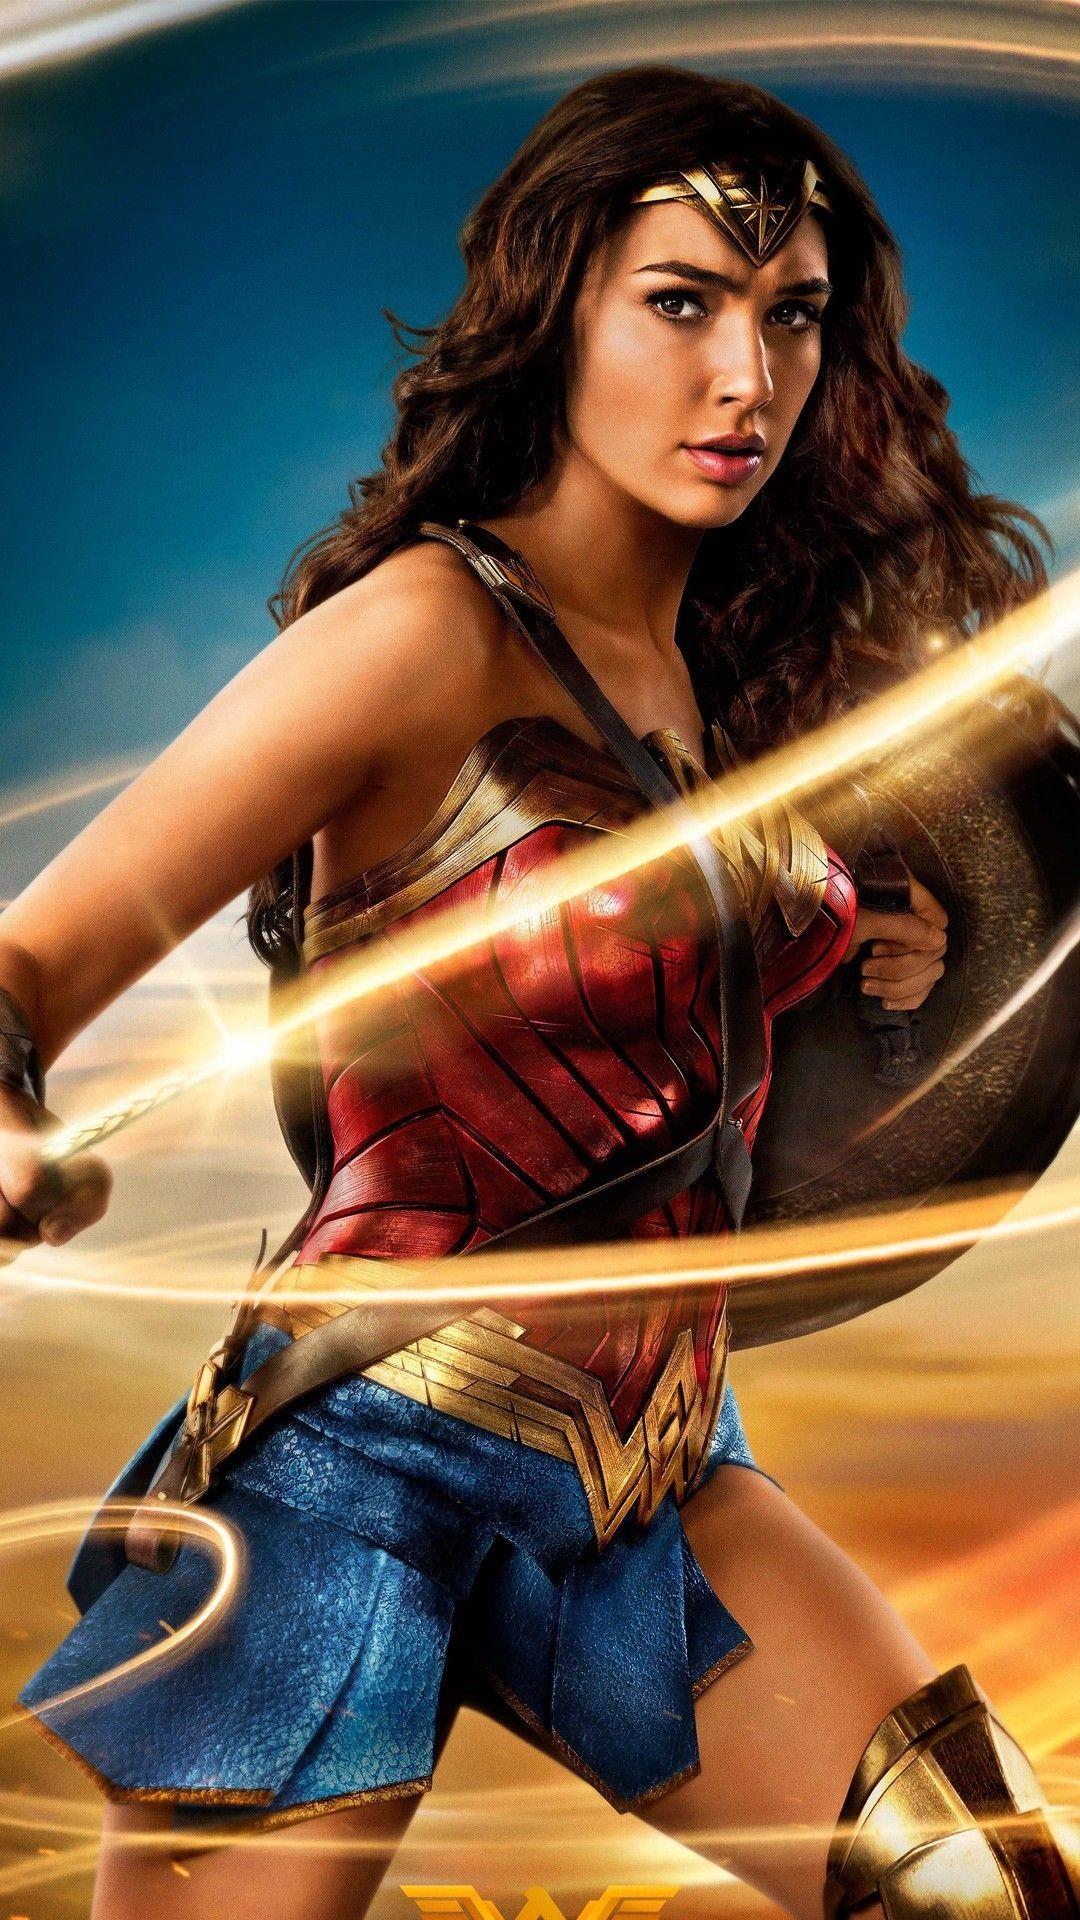 Res: 1080x1920, Gal Gadot Wonder Woman Wallpaper For Mobile - Best iPhone Wallpaper